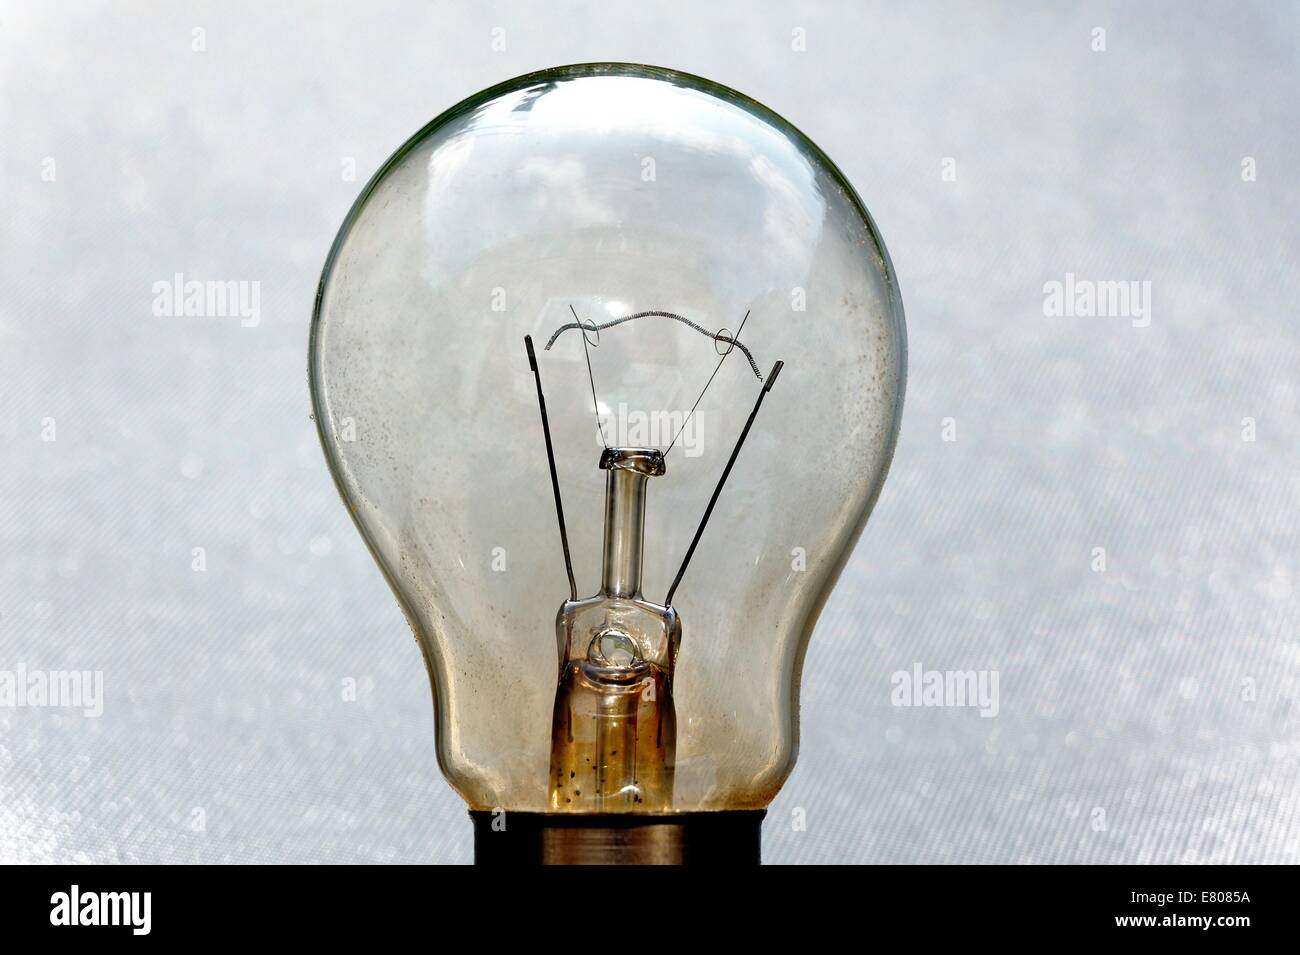 Close Up Shot Of A Light Bulb With A Broken Filament Stock Photo